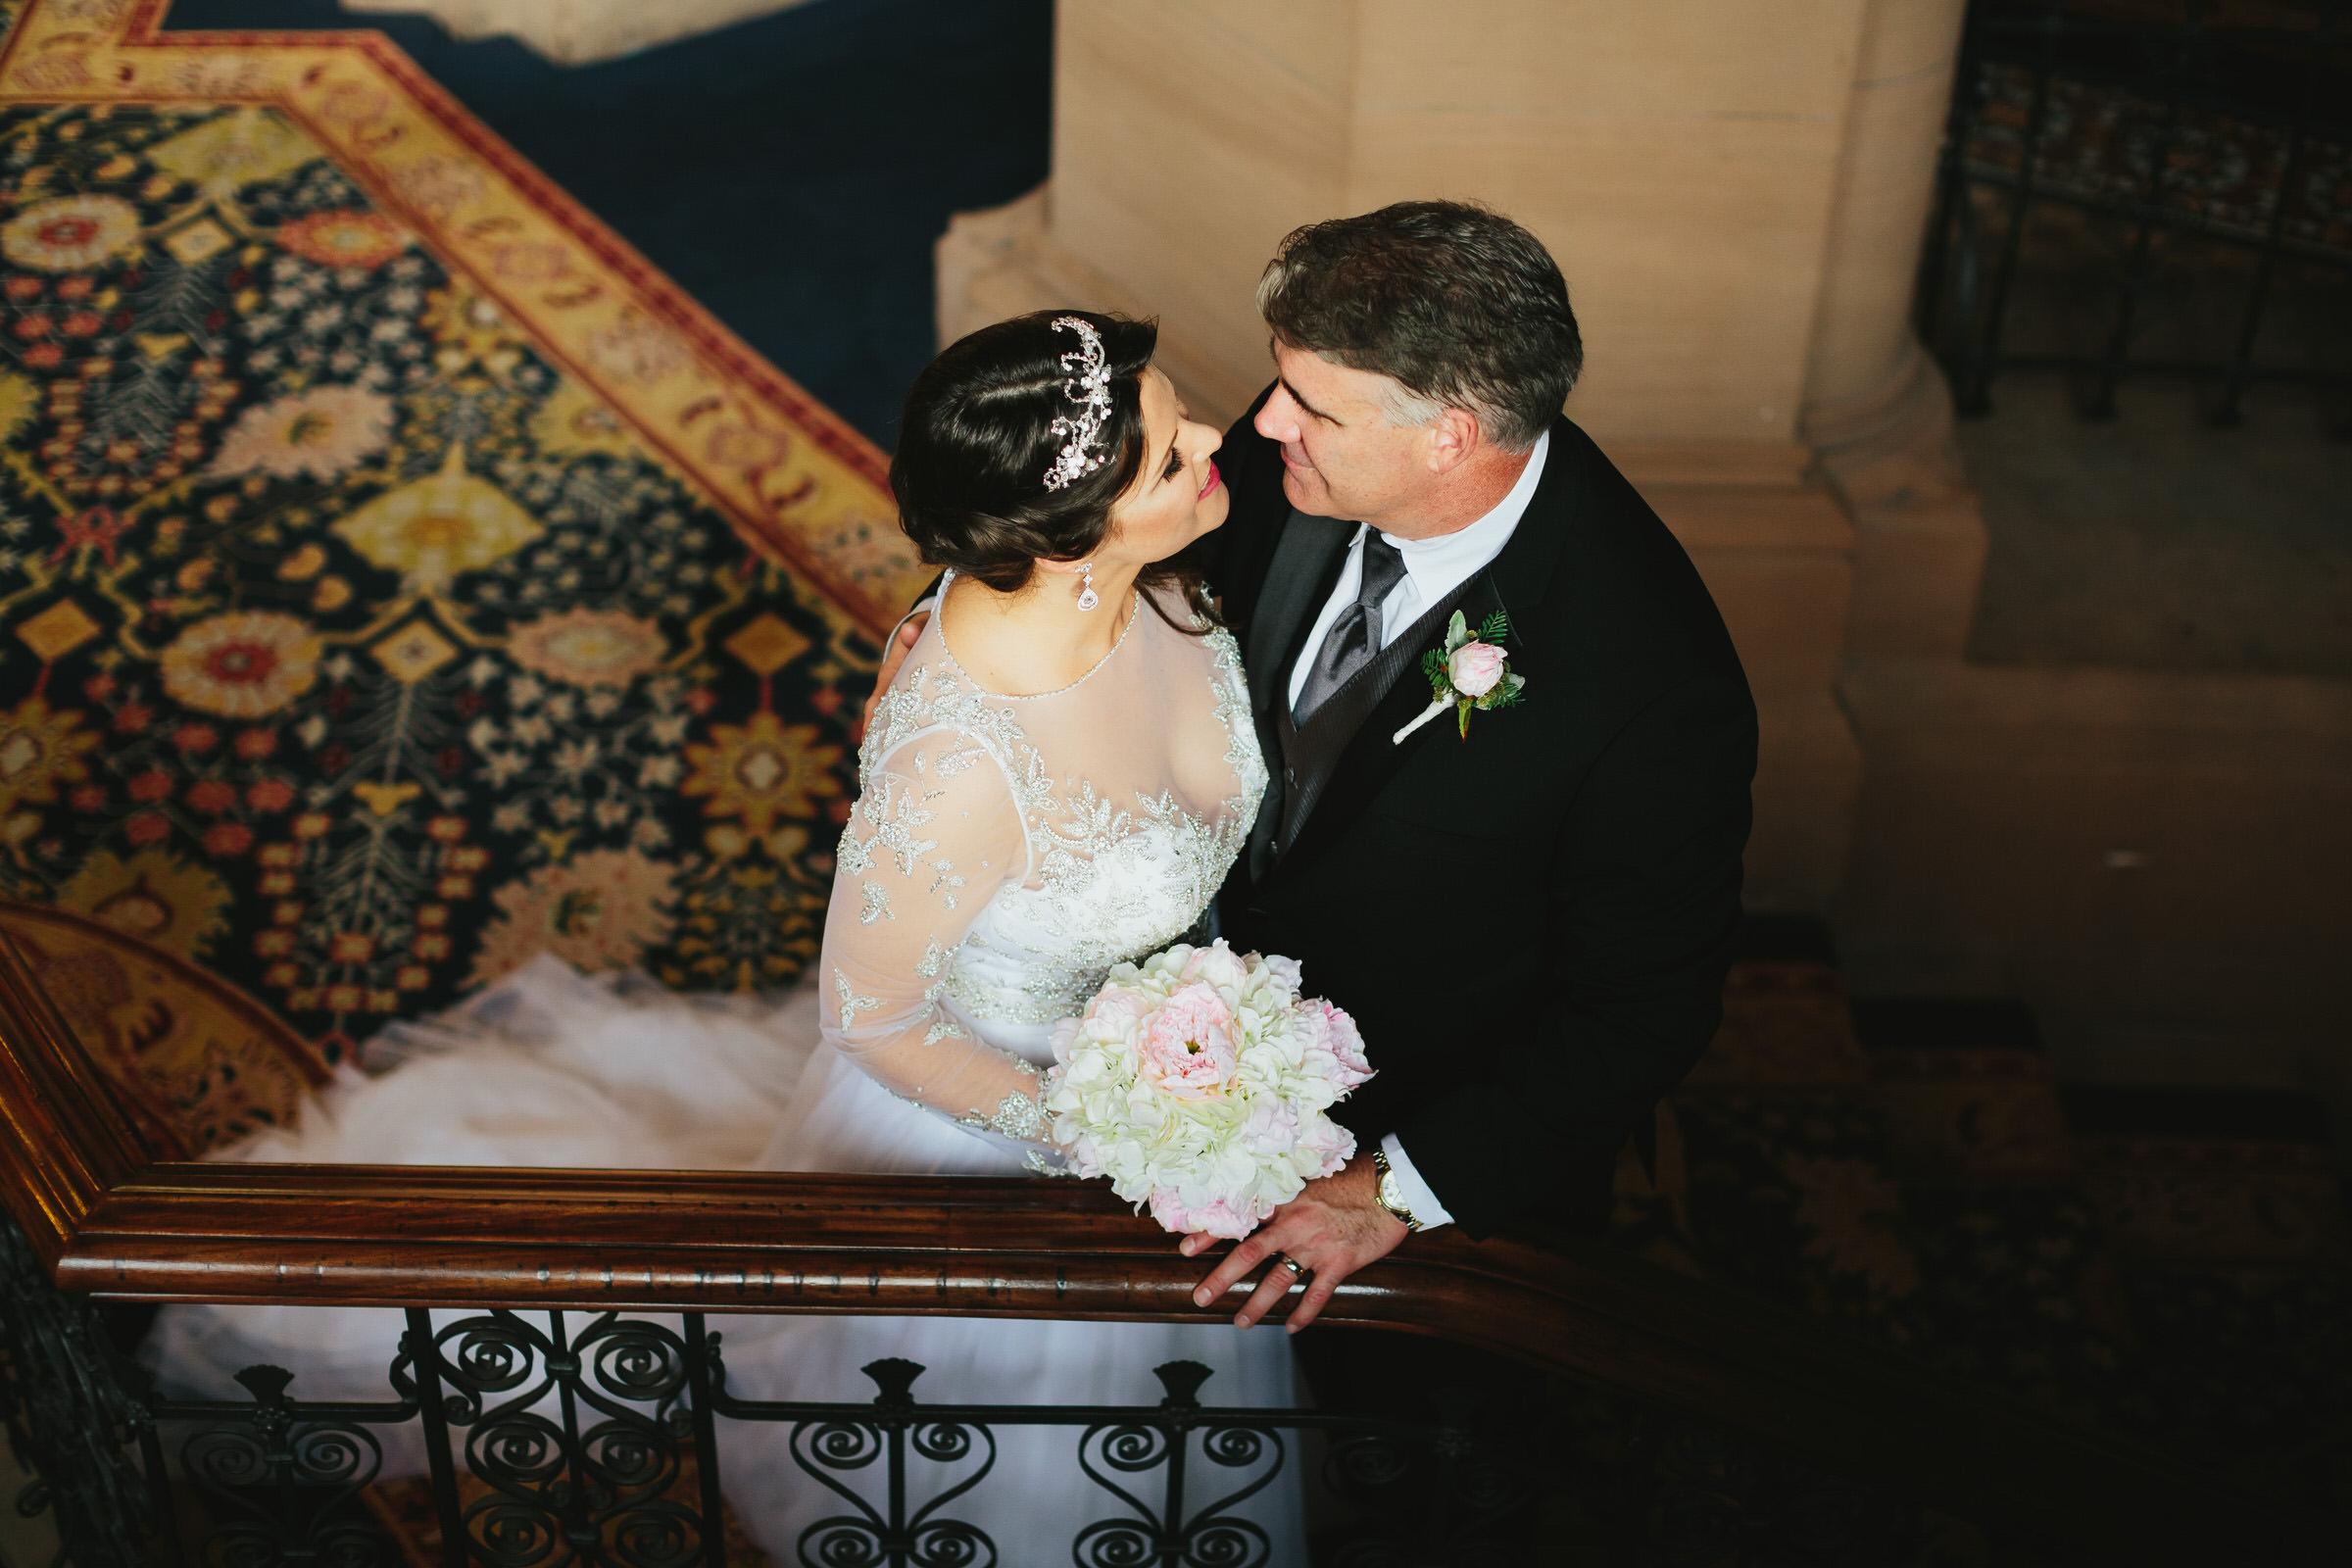 St Pancras Renaissance Hotel wedding - Lee & Bo